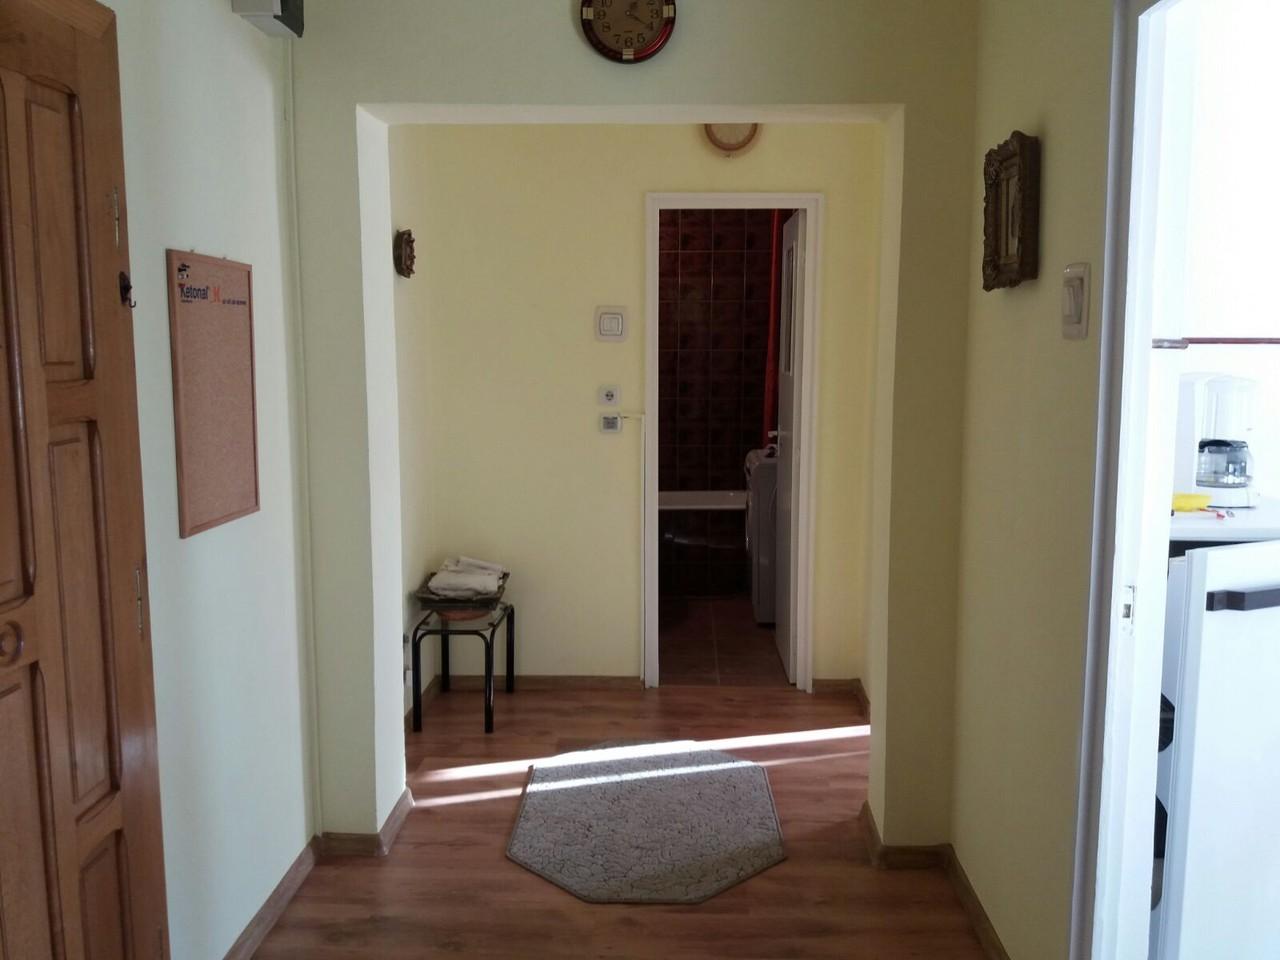 Apartament 2 camere de inchiriat in Sibiu zona Spitalului-10-5